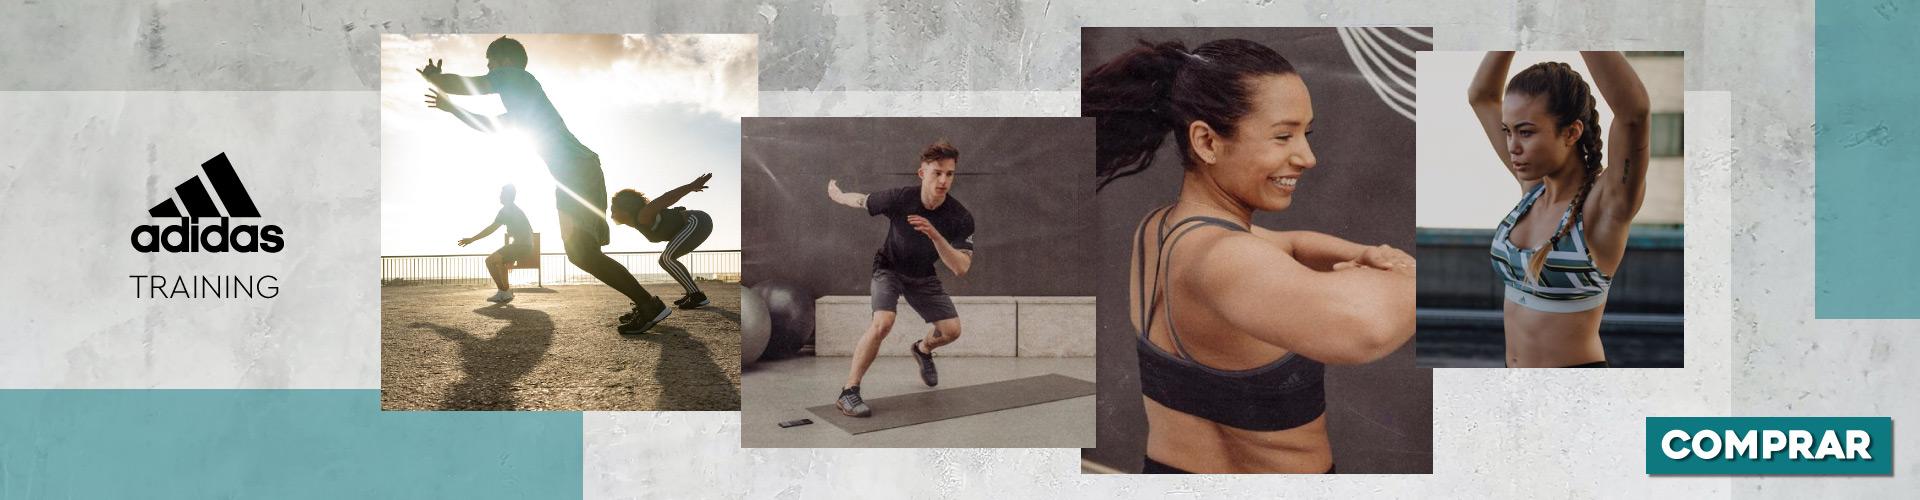 Adidas training DT